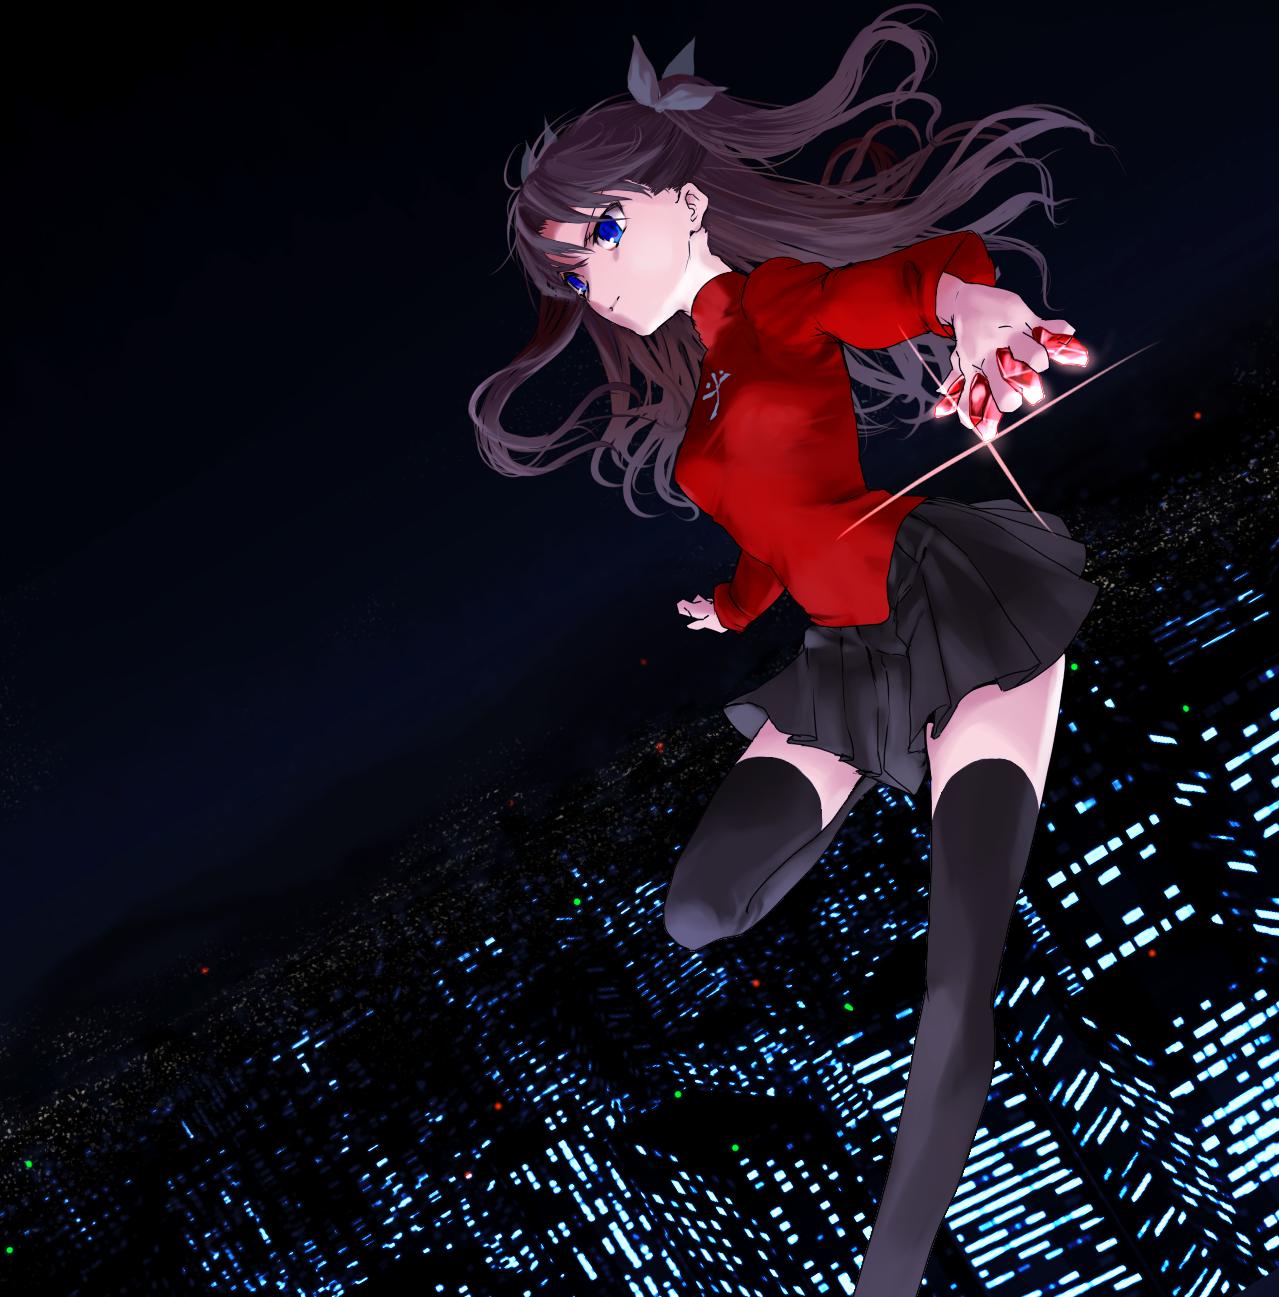 Pinterest Fate Stay Night Tohsaka Rin Anime